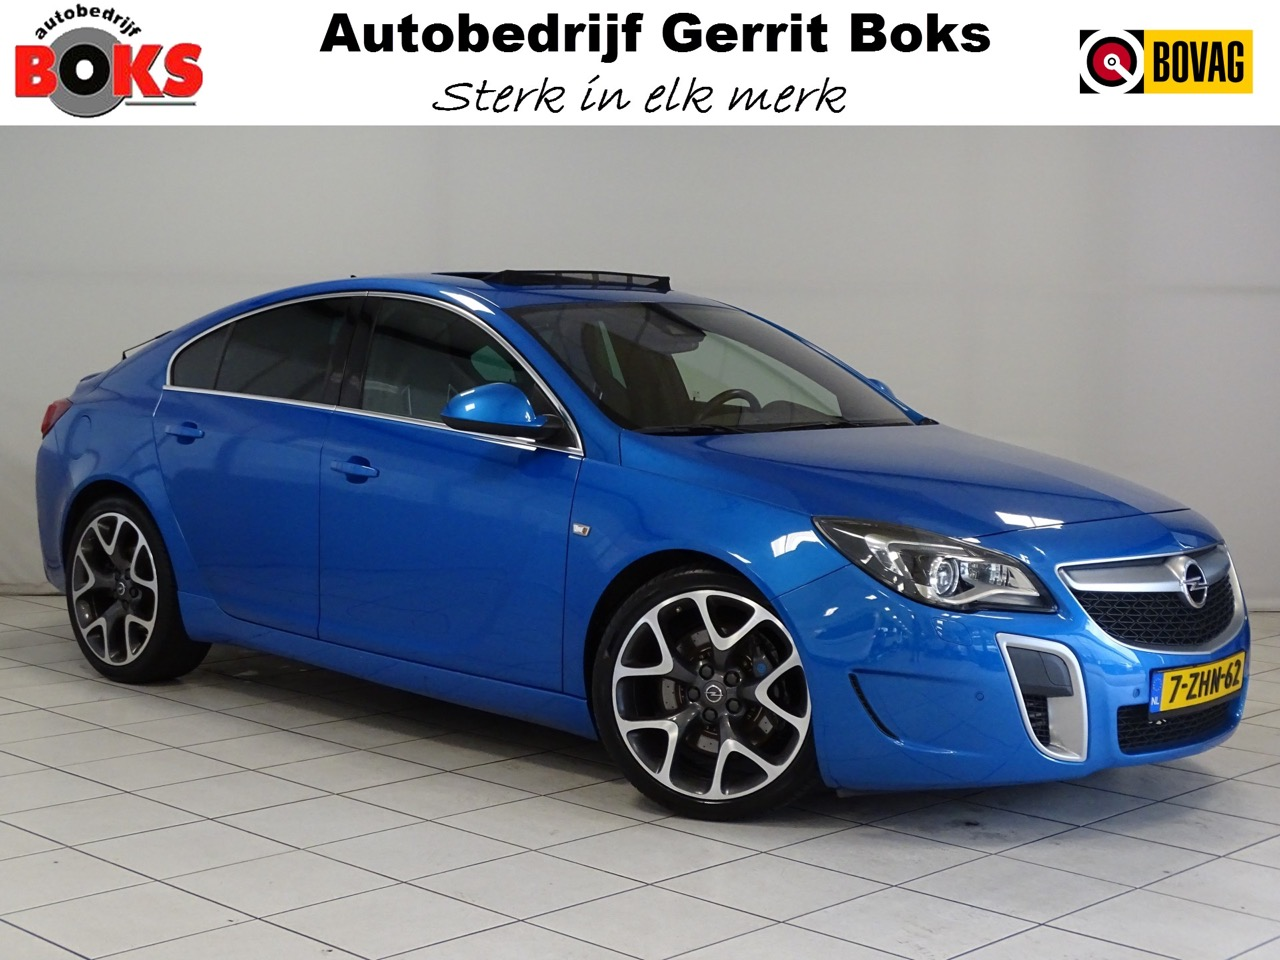 Opel-Insignia-OPC-Ali-B-occasion-01.jpg